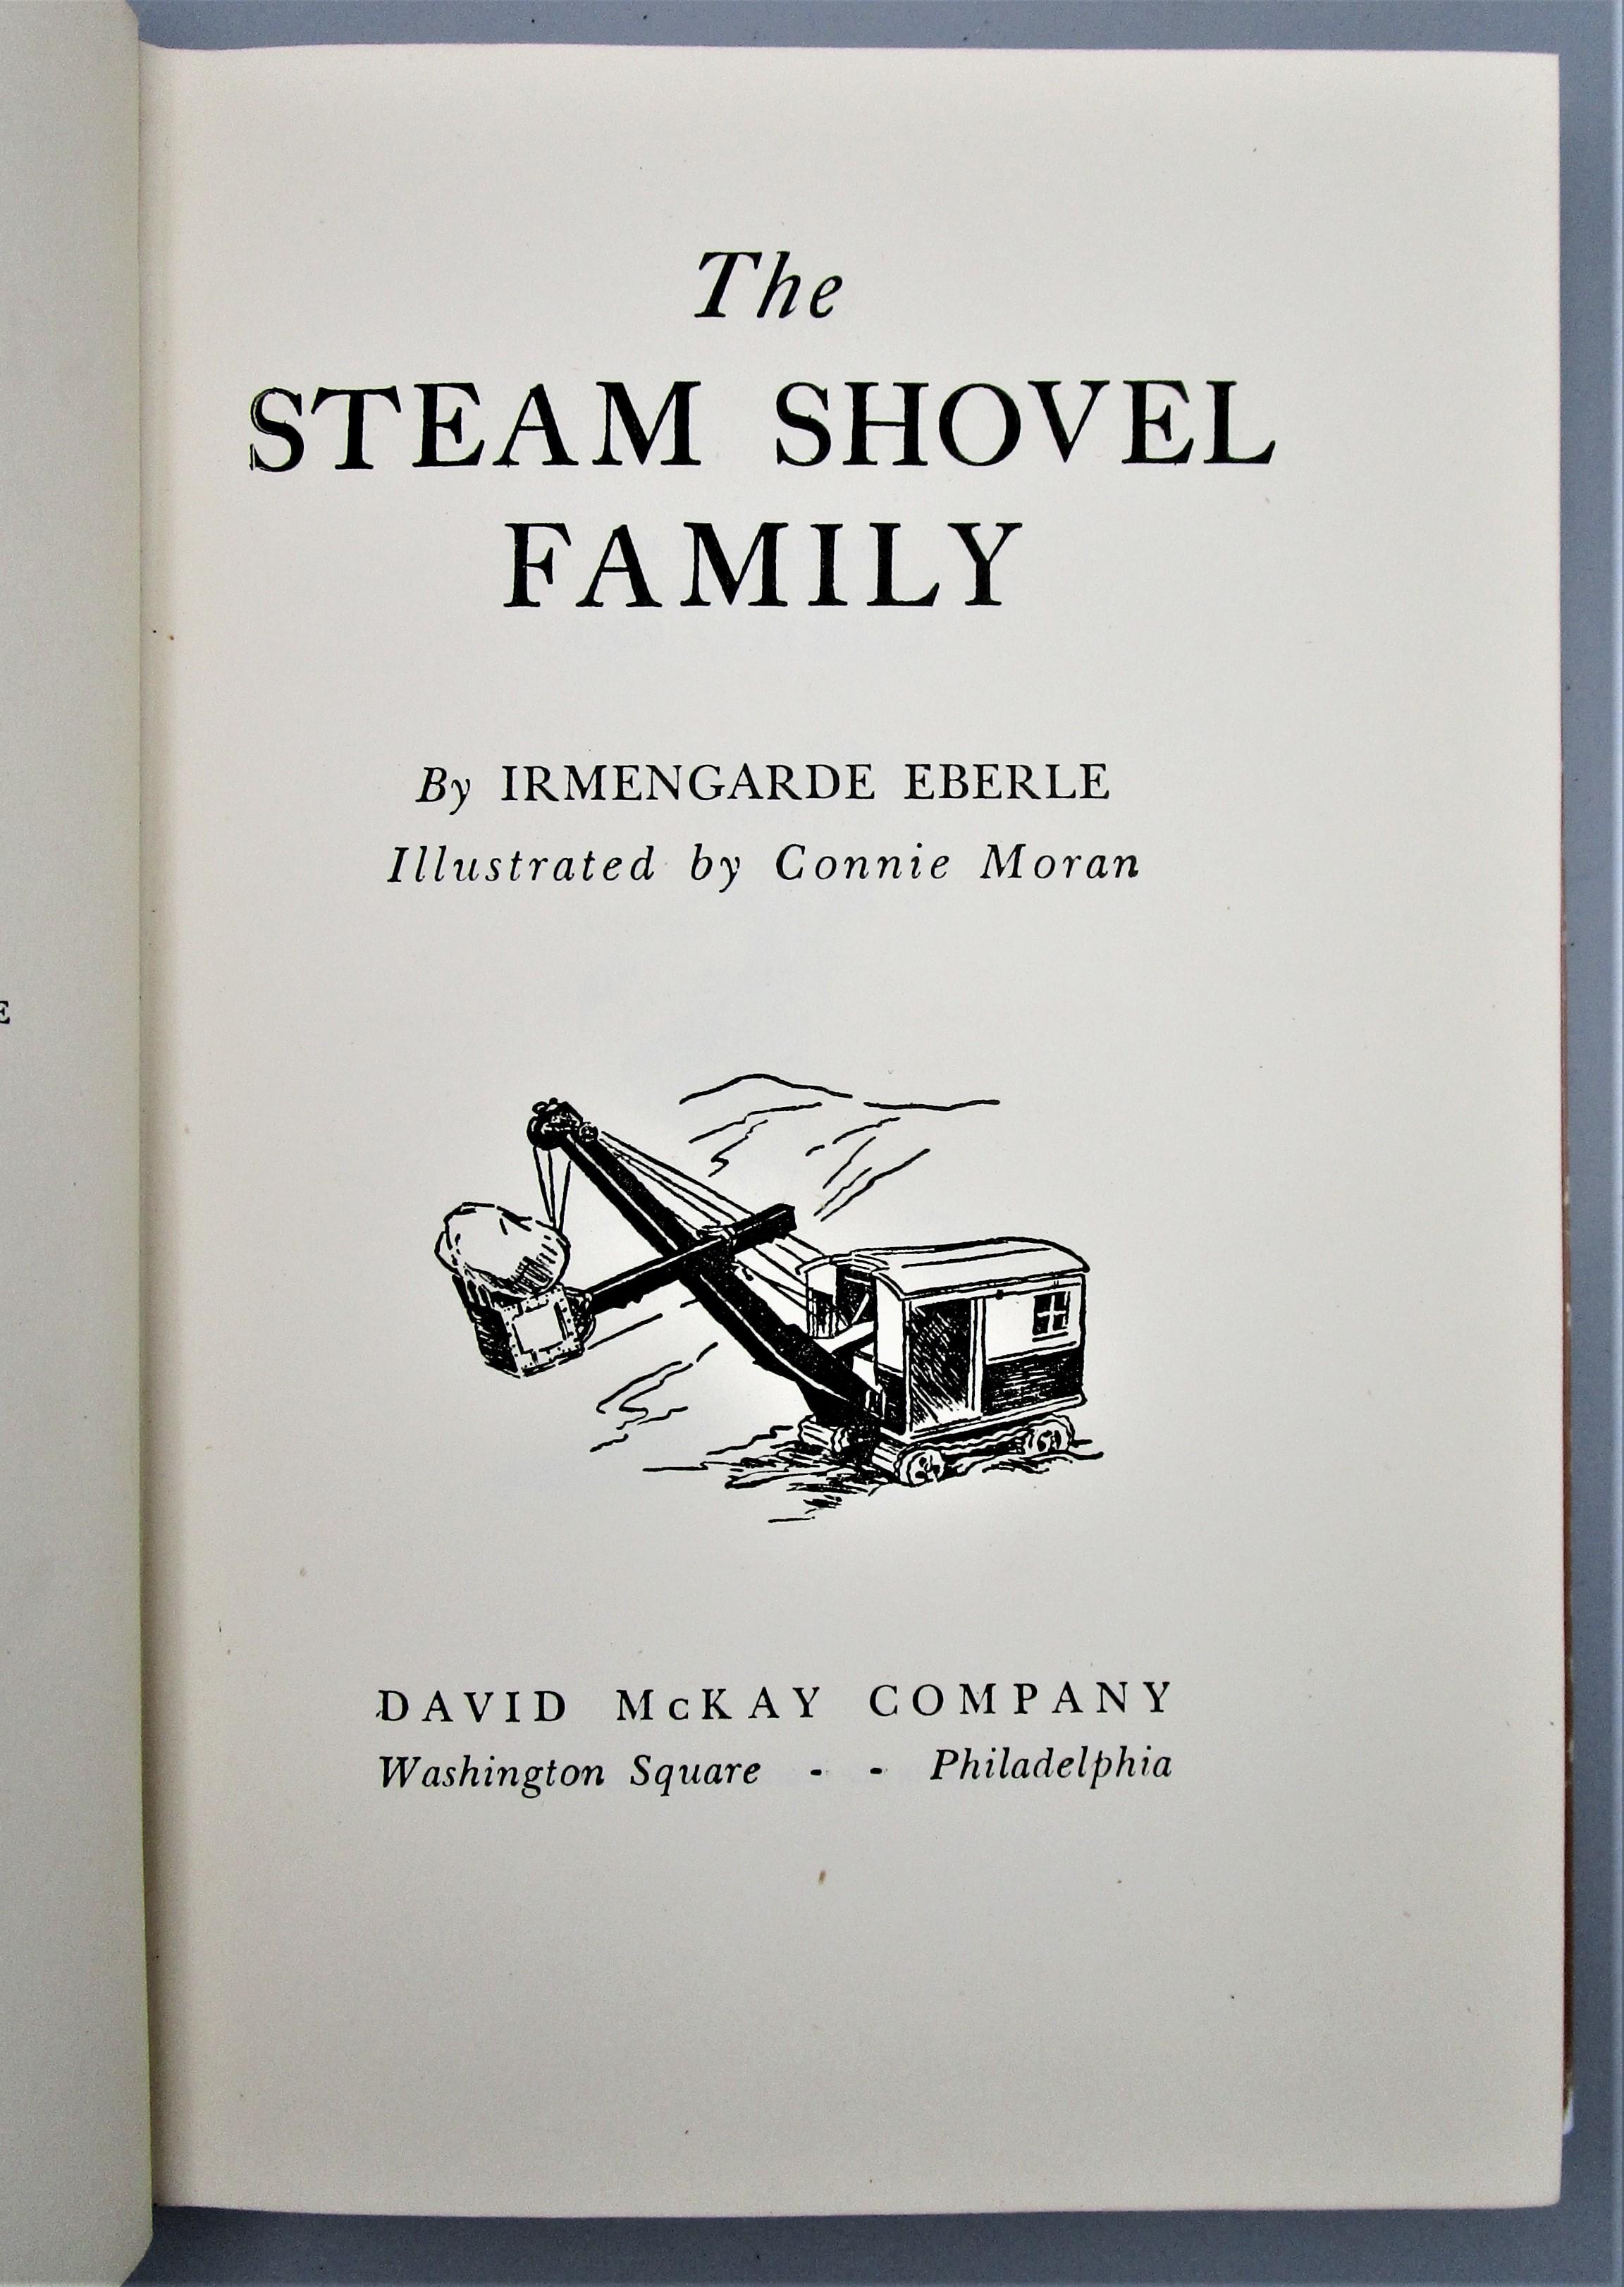 THE STEAM SHOVEL FAMILY, by Irmengarde Eberle - 1948 [Signed 1st Ed]